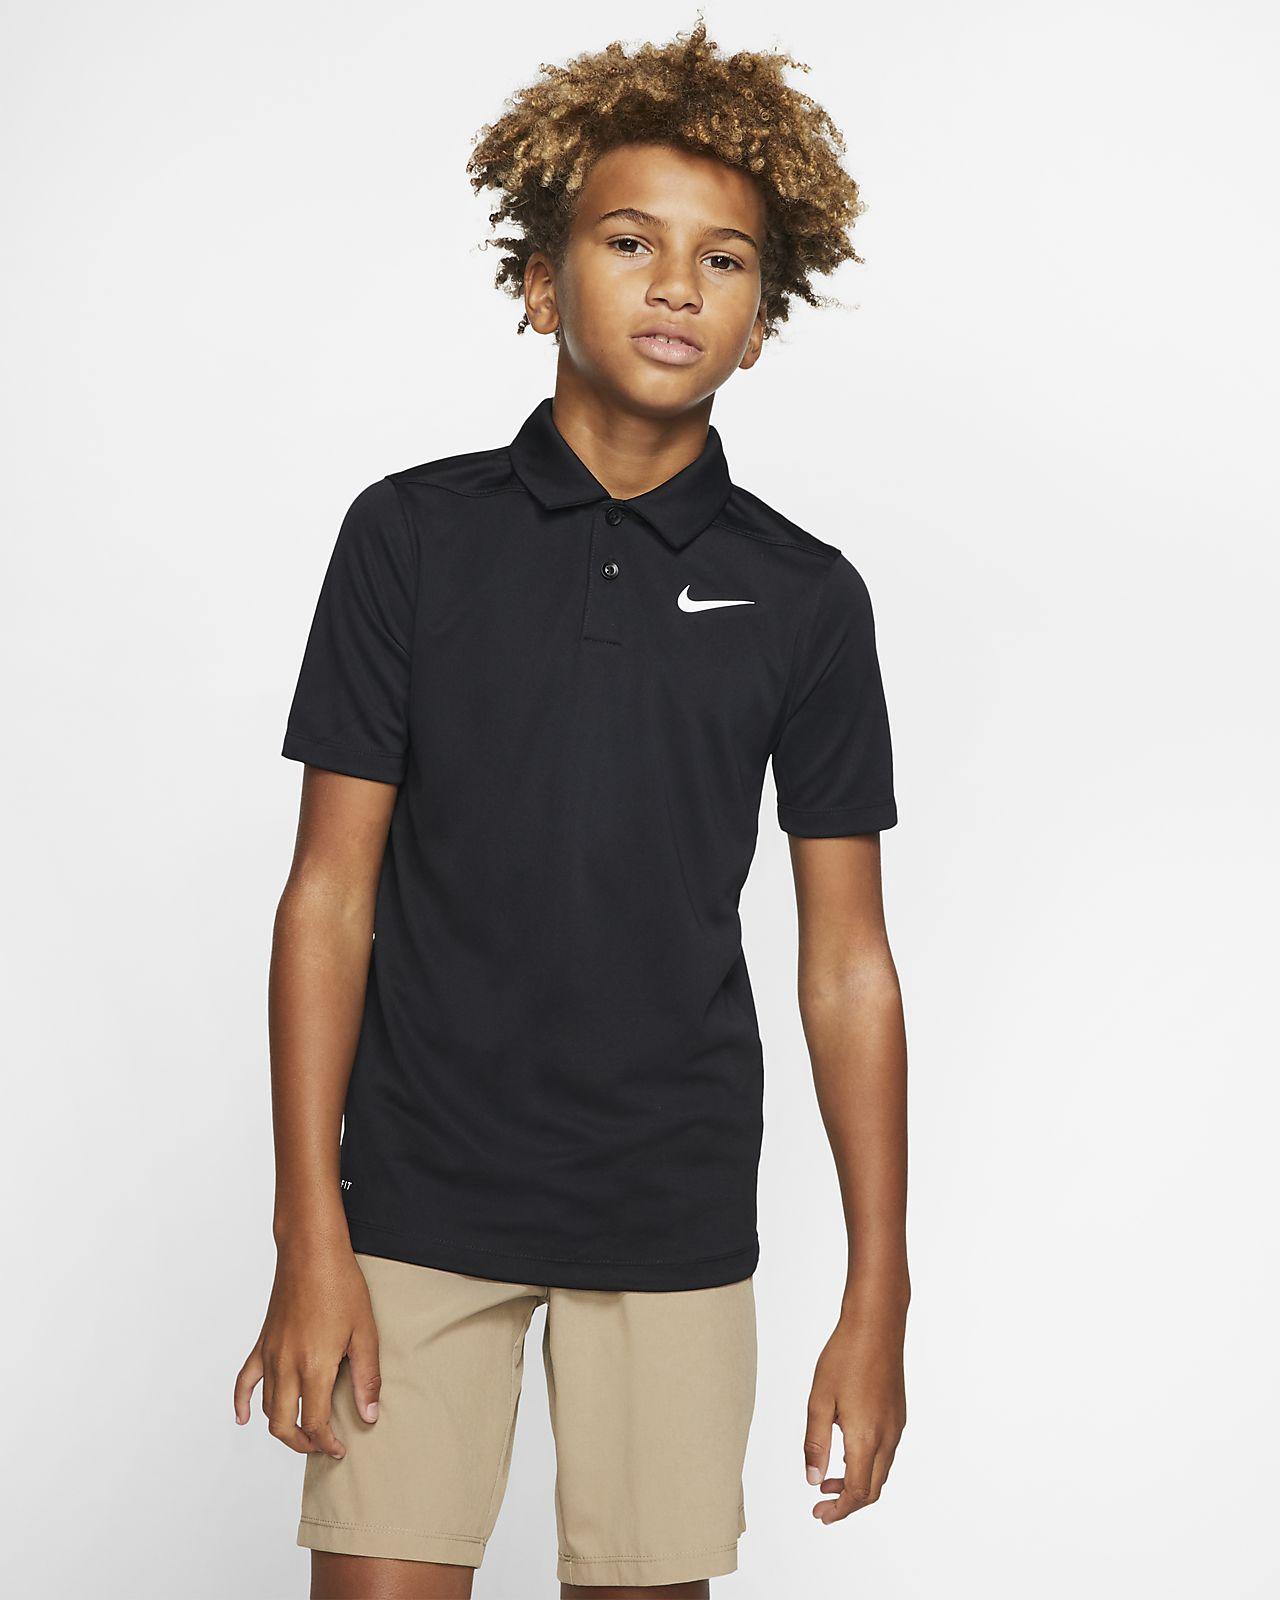 Nike Dri-FIT Victory golfskjorte for store barn (gutt)